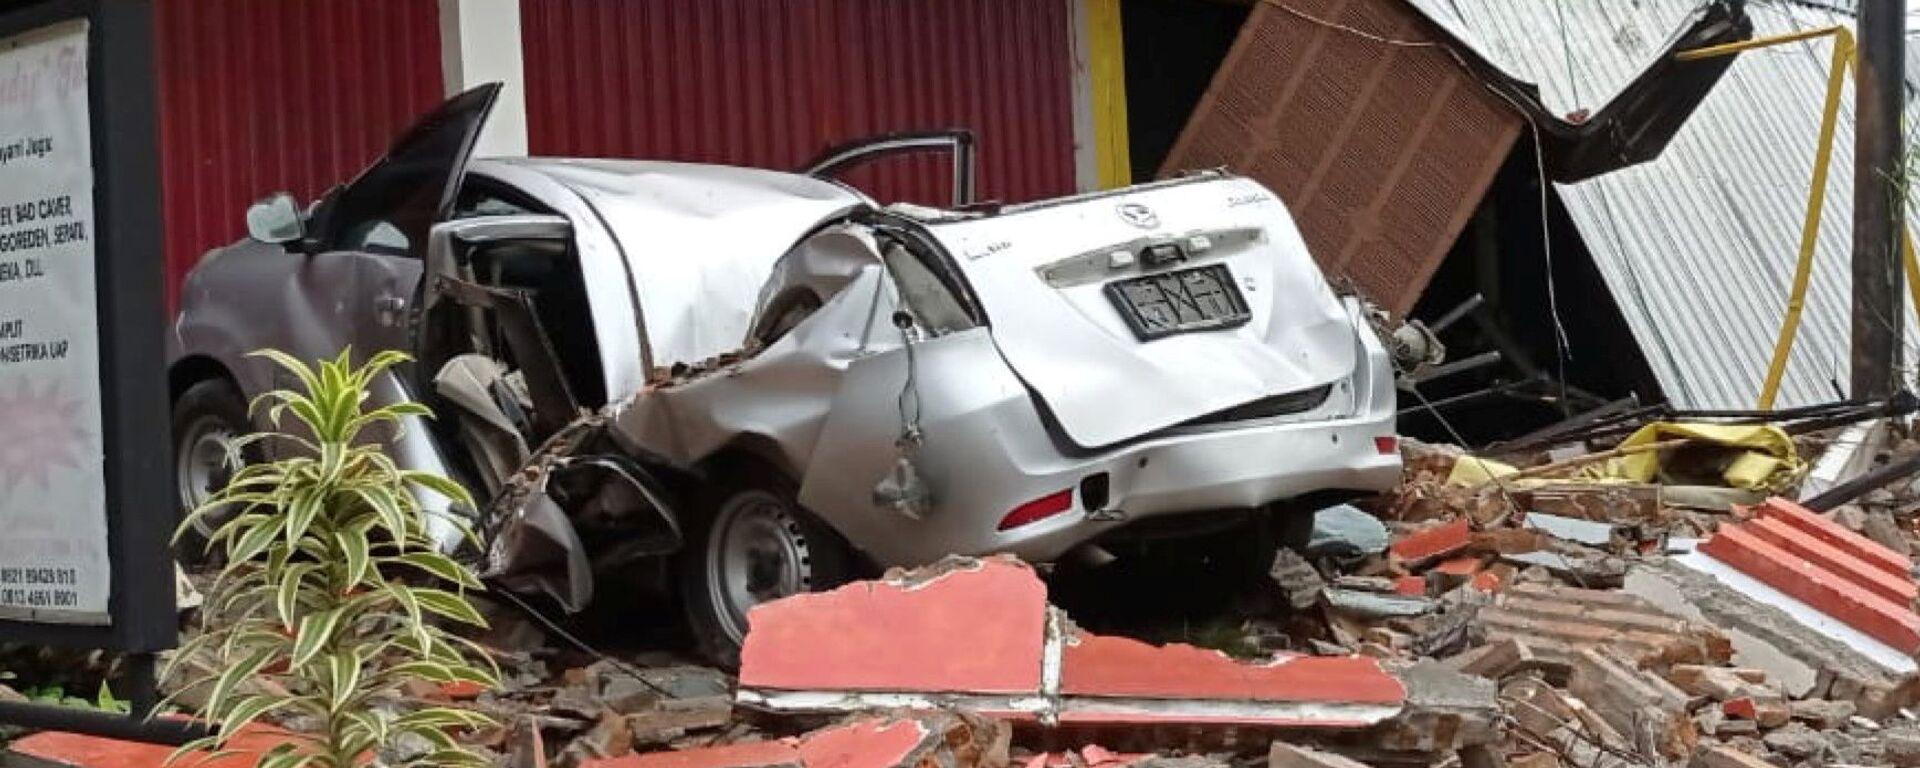 Последствия землетрясения в городе Мамаджу, Индонезия - Sputnik Таджикистан, 1920, 10.07.2021